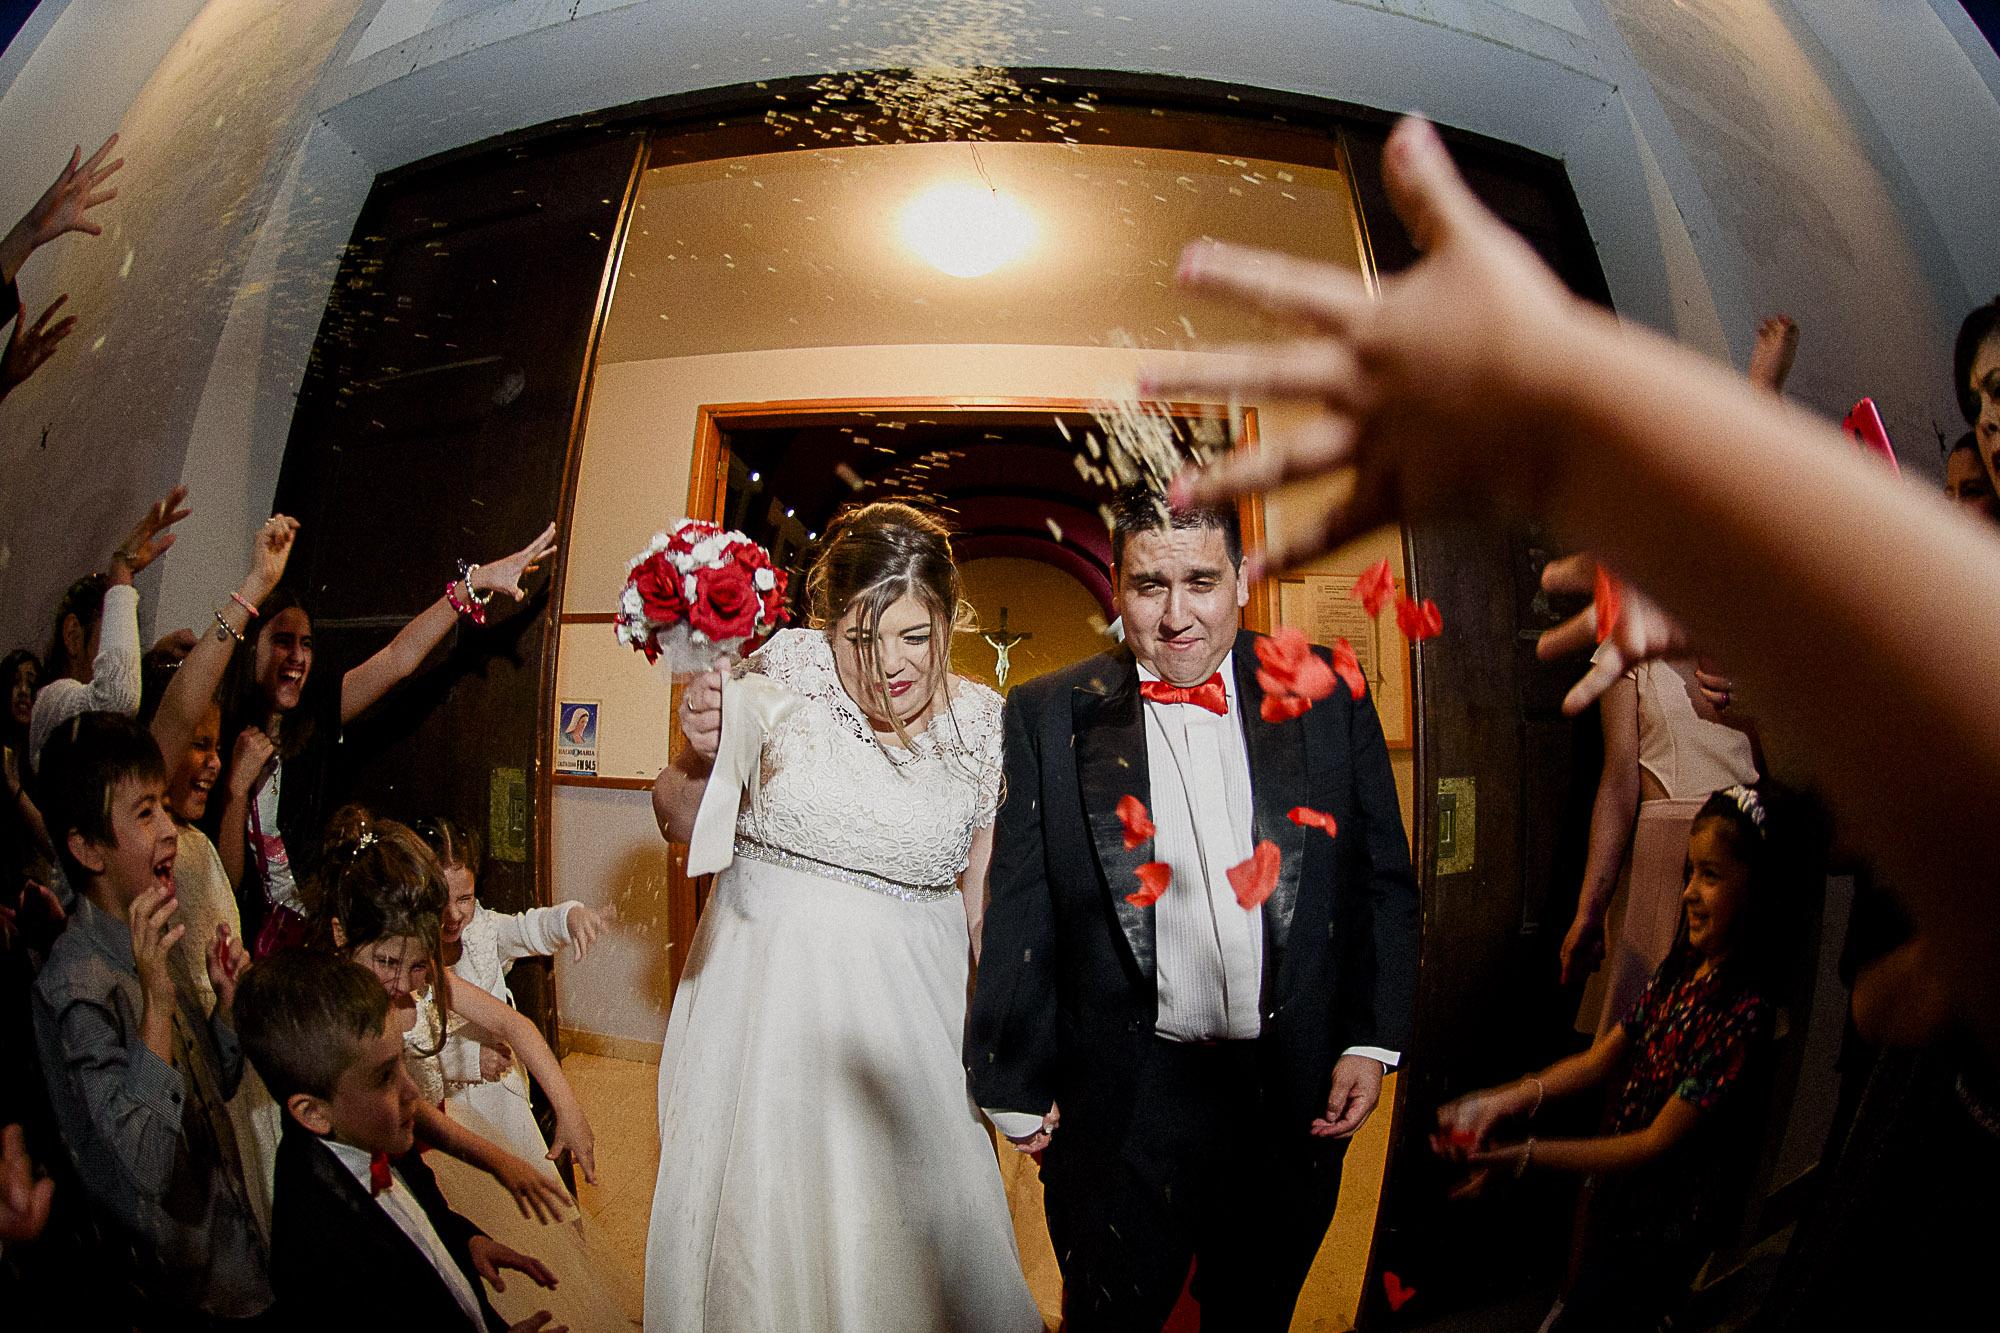 boda-vero-raul-patagonia-argentina-chilena-fotografo-de-bodas-argentina-casamiento-en-patagonia-gabriel-roa-photography-17